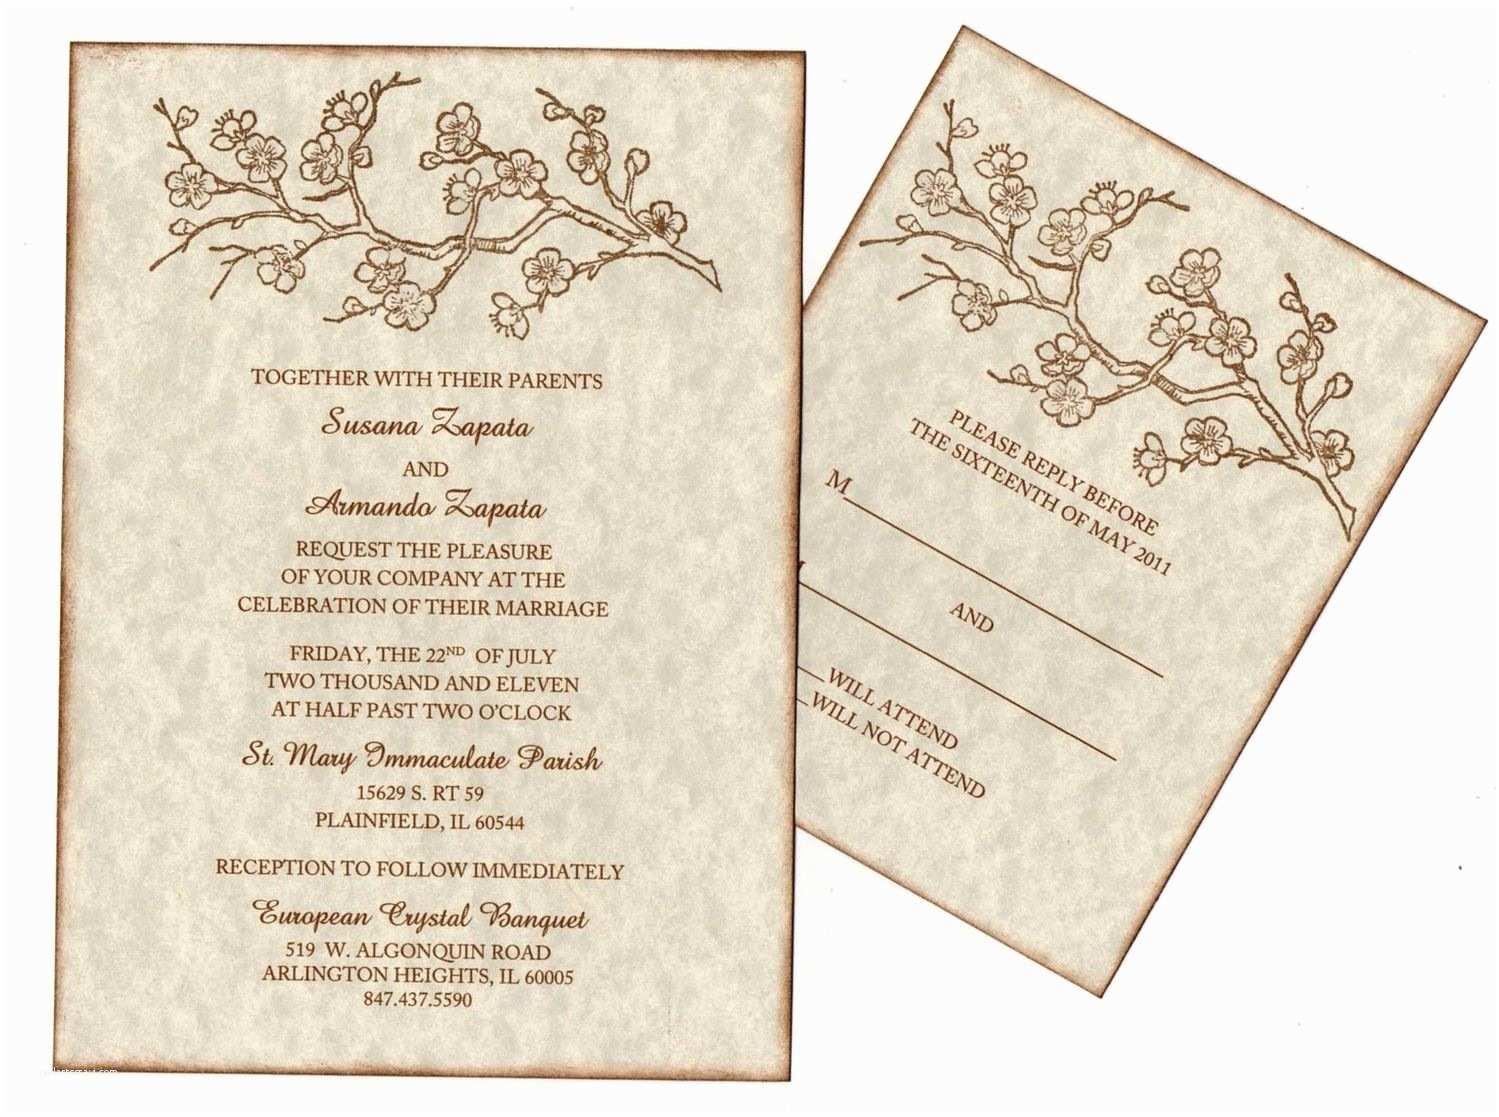 Indian Wedding Reception Invitation Templates Wedding Invitation Wording Indian Wedding Invitation